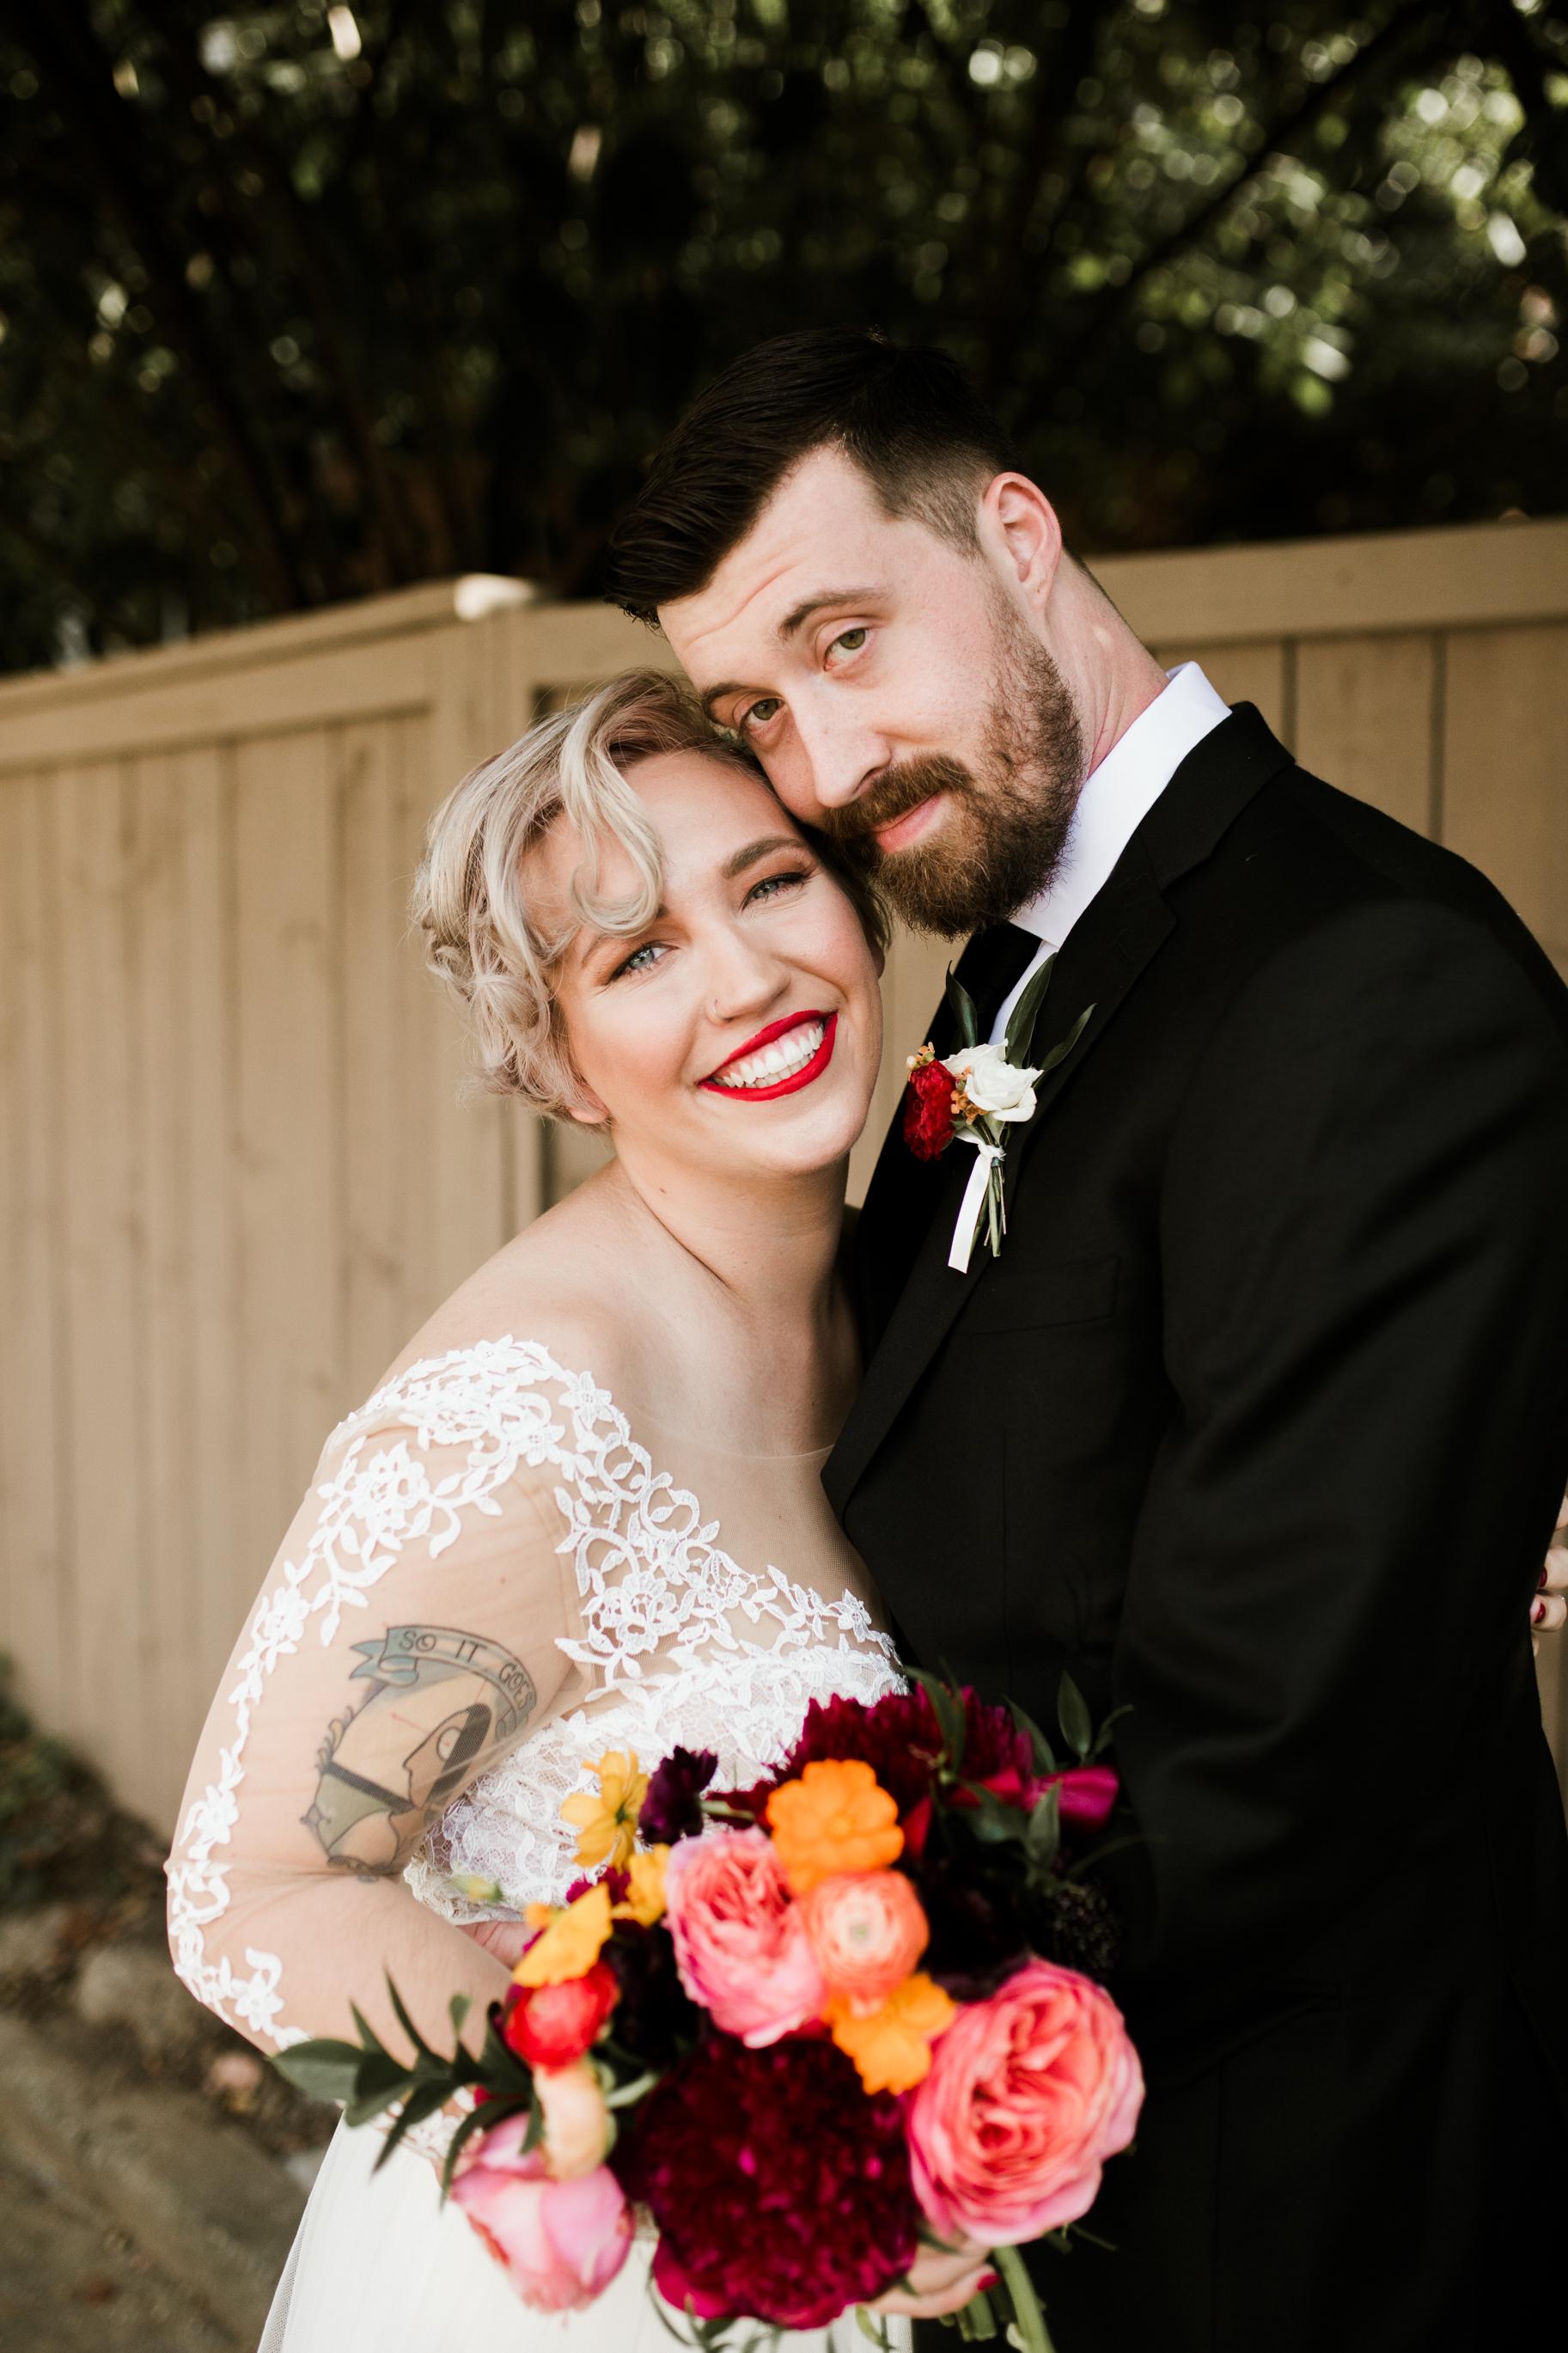 Kentucky Wedding Louisville Wedding Photographer 2018 Crystal Ludwick Photo Louisville Wedding Photographer Kentucky Wedding Photographer (105 of 105).jpg